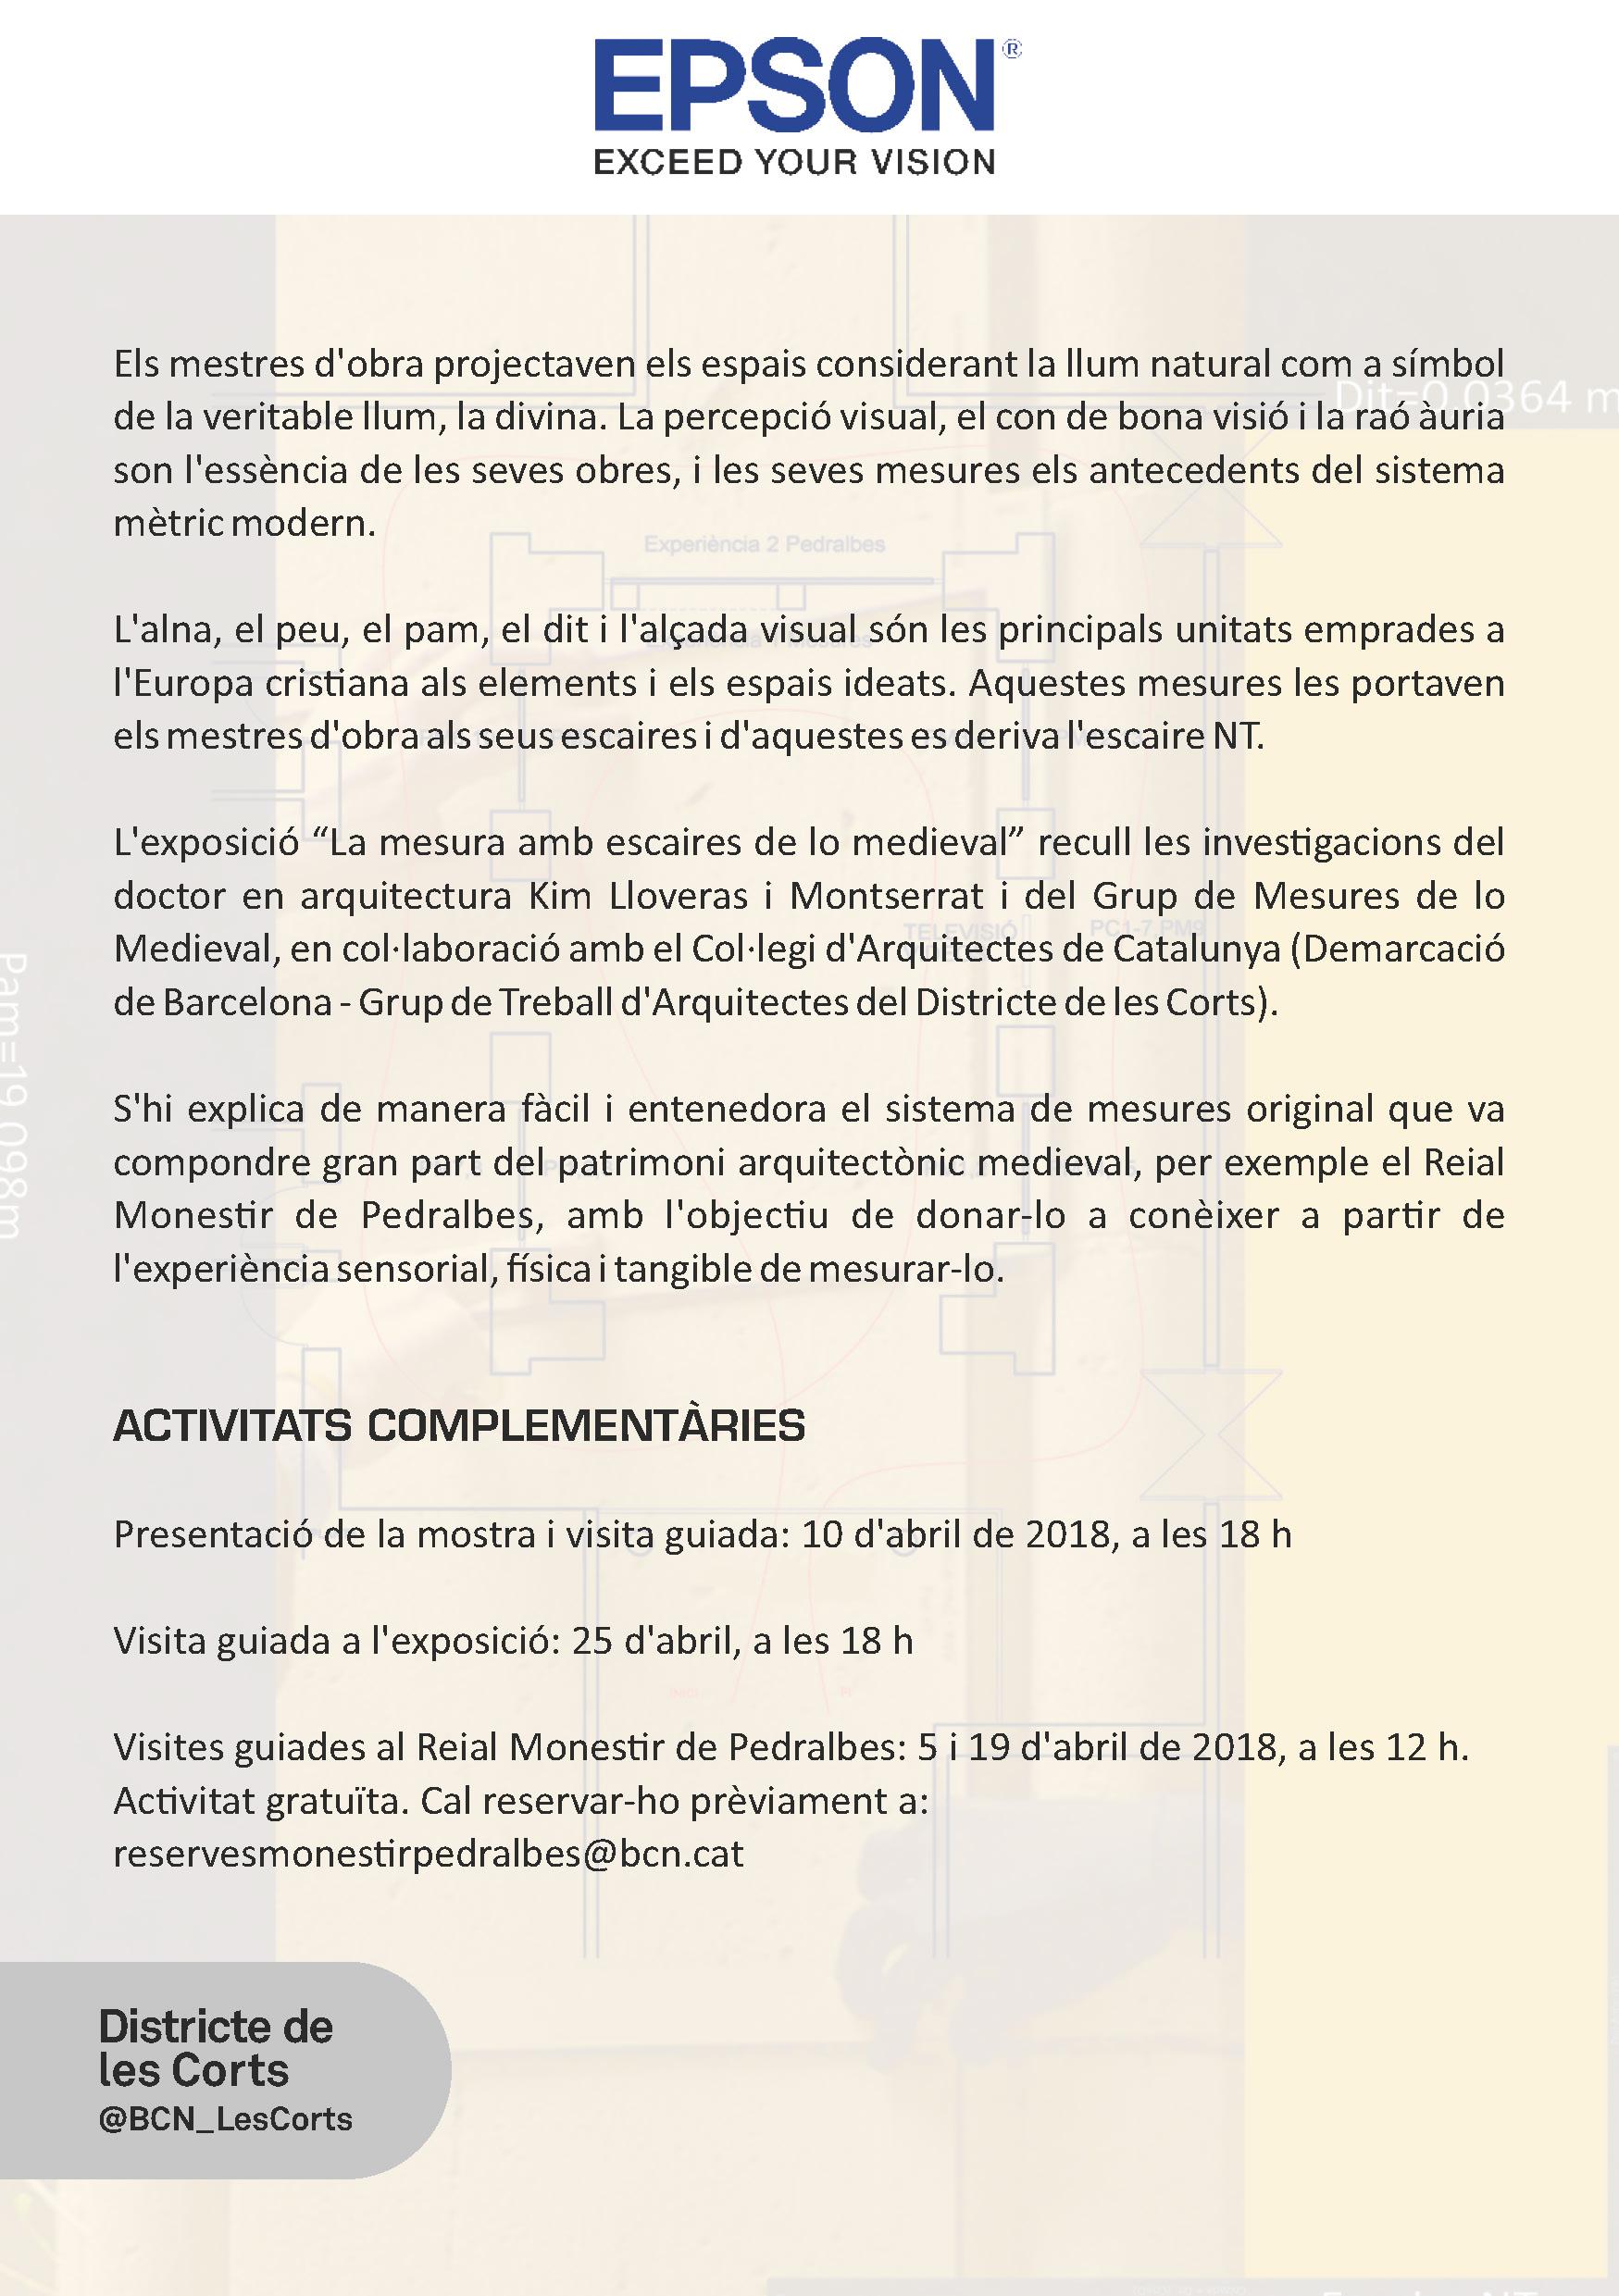 20180405 Les Corts_Page_3.jpg